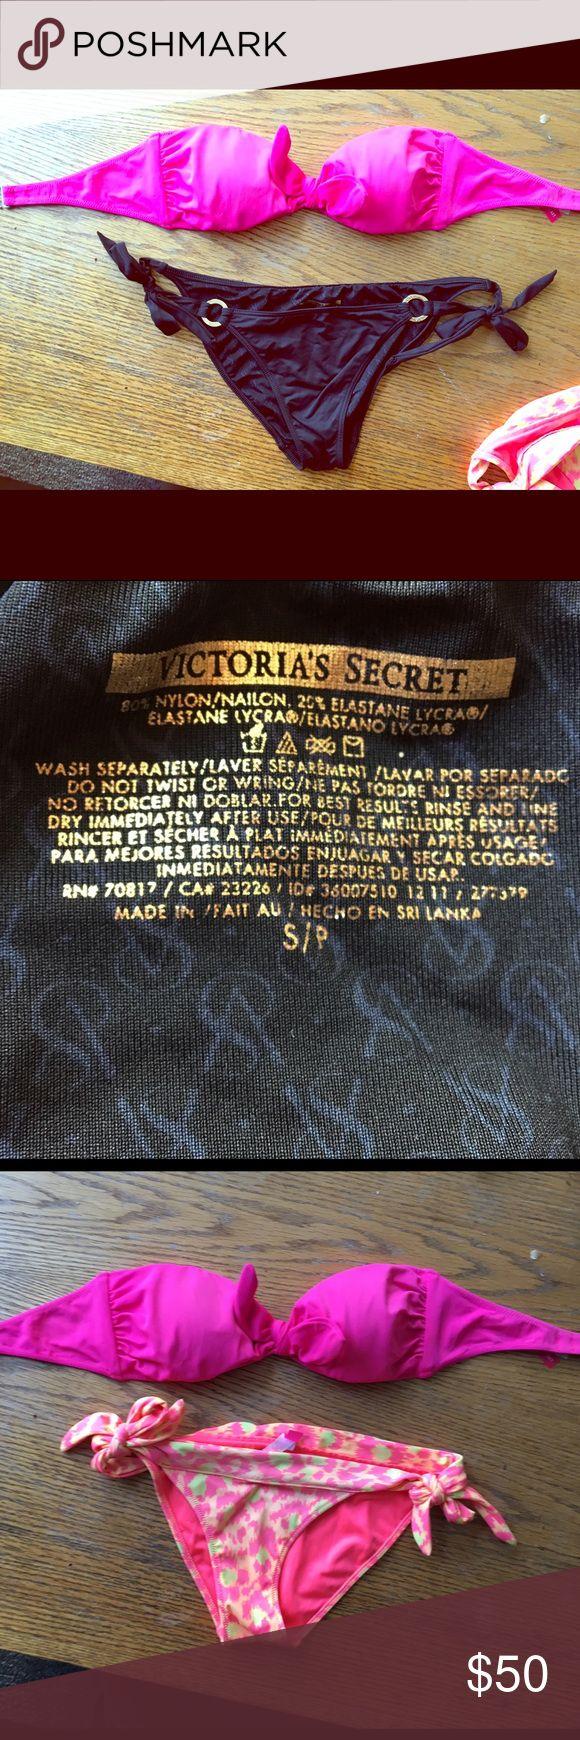 VS bikini set All worn down in Mexico 🇲🇽 never worn again Victoria's Secret Swim Bikinis